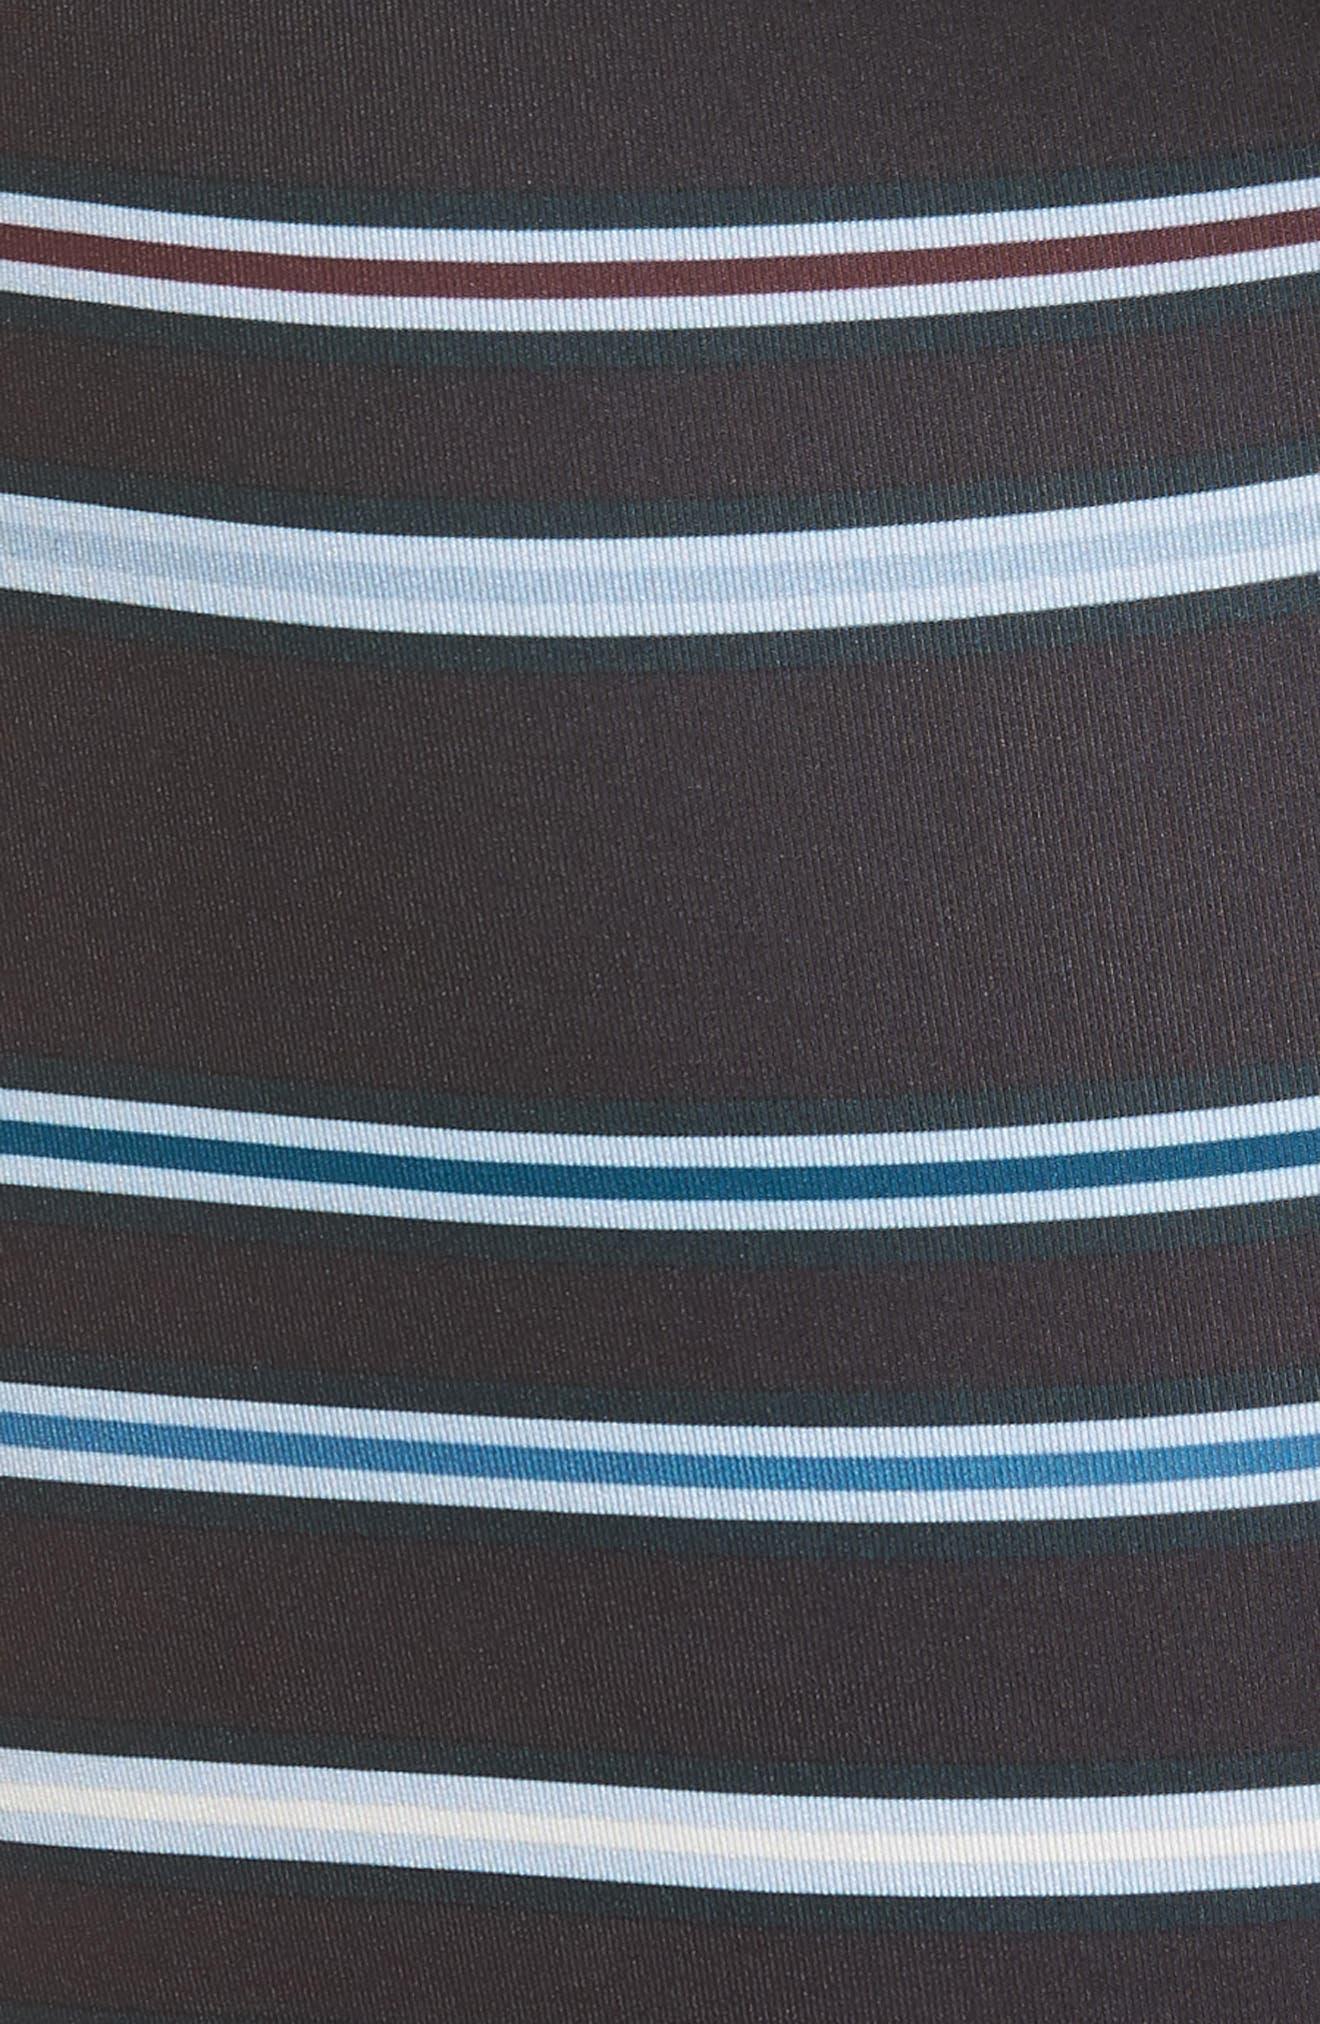 Beyond Striped Boxer Briefs,                             Alternate thumbnail 5, color,                             BLACK